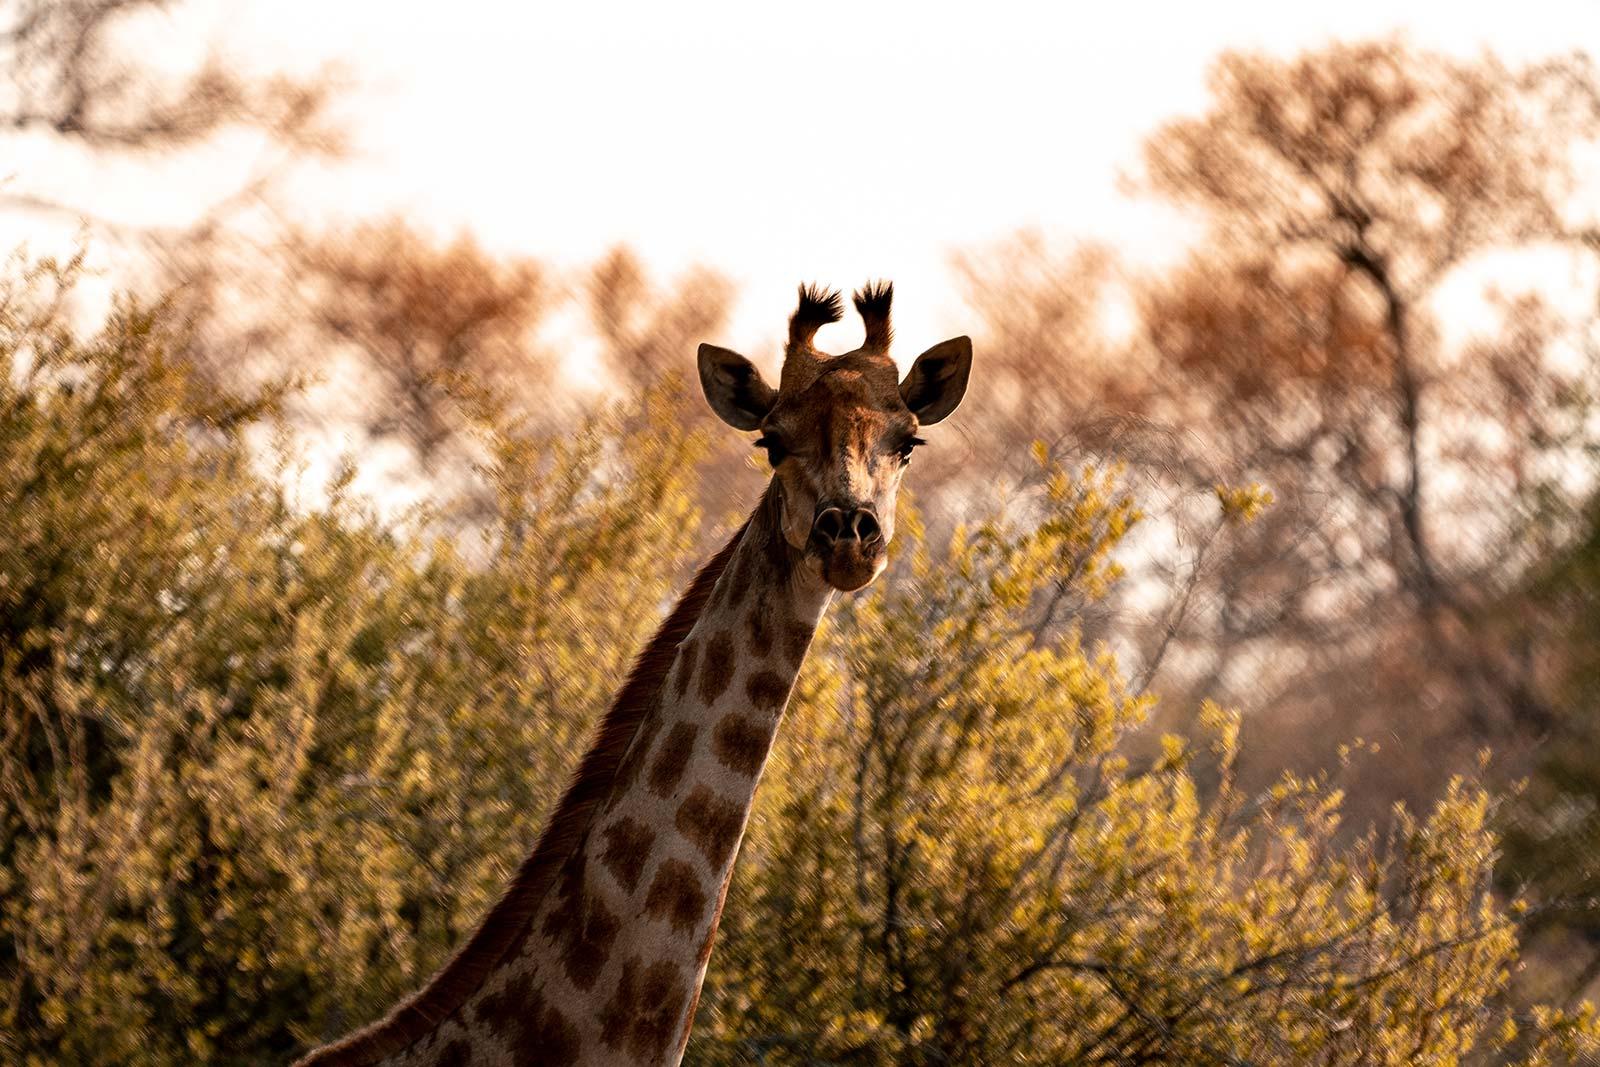 Giraffe in Botswana, Africa. Cheetah, cubs & the most incredible dinner setting